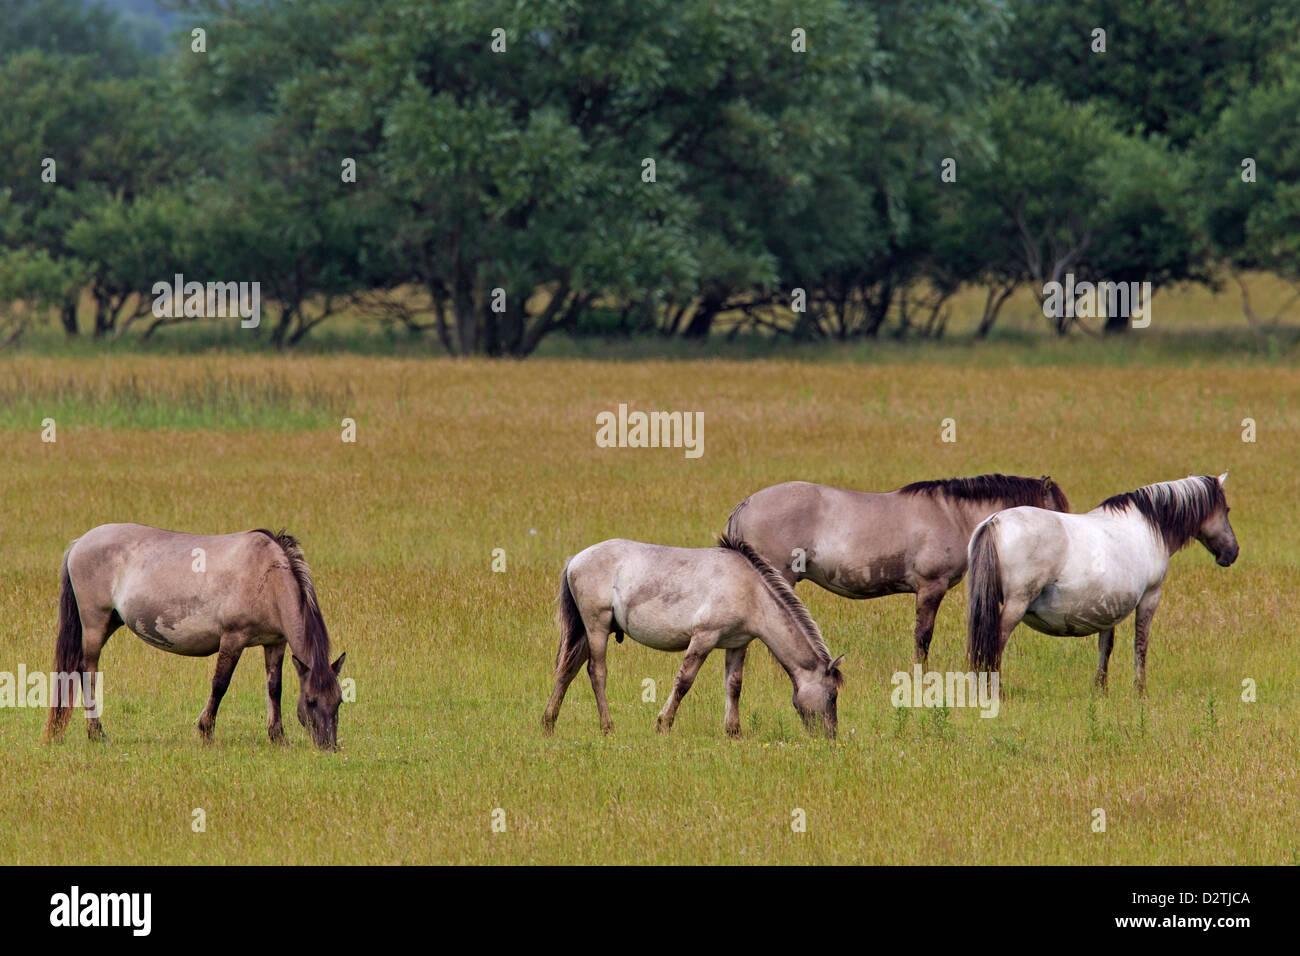 Herd of Konik horses, Polish primitive horse breed from Poland, grazing in field Stock Photo